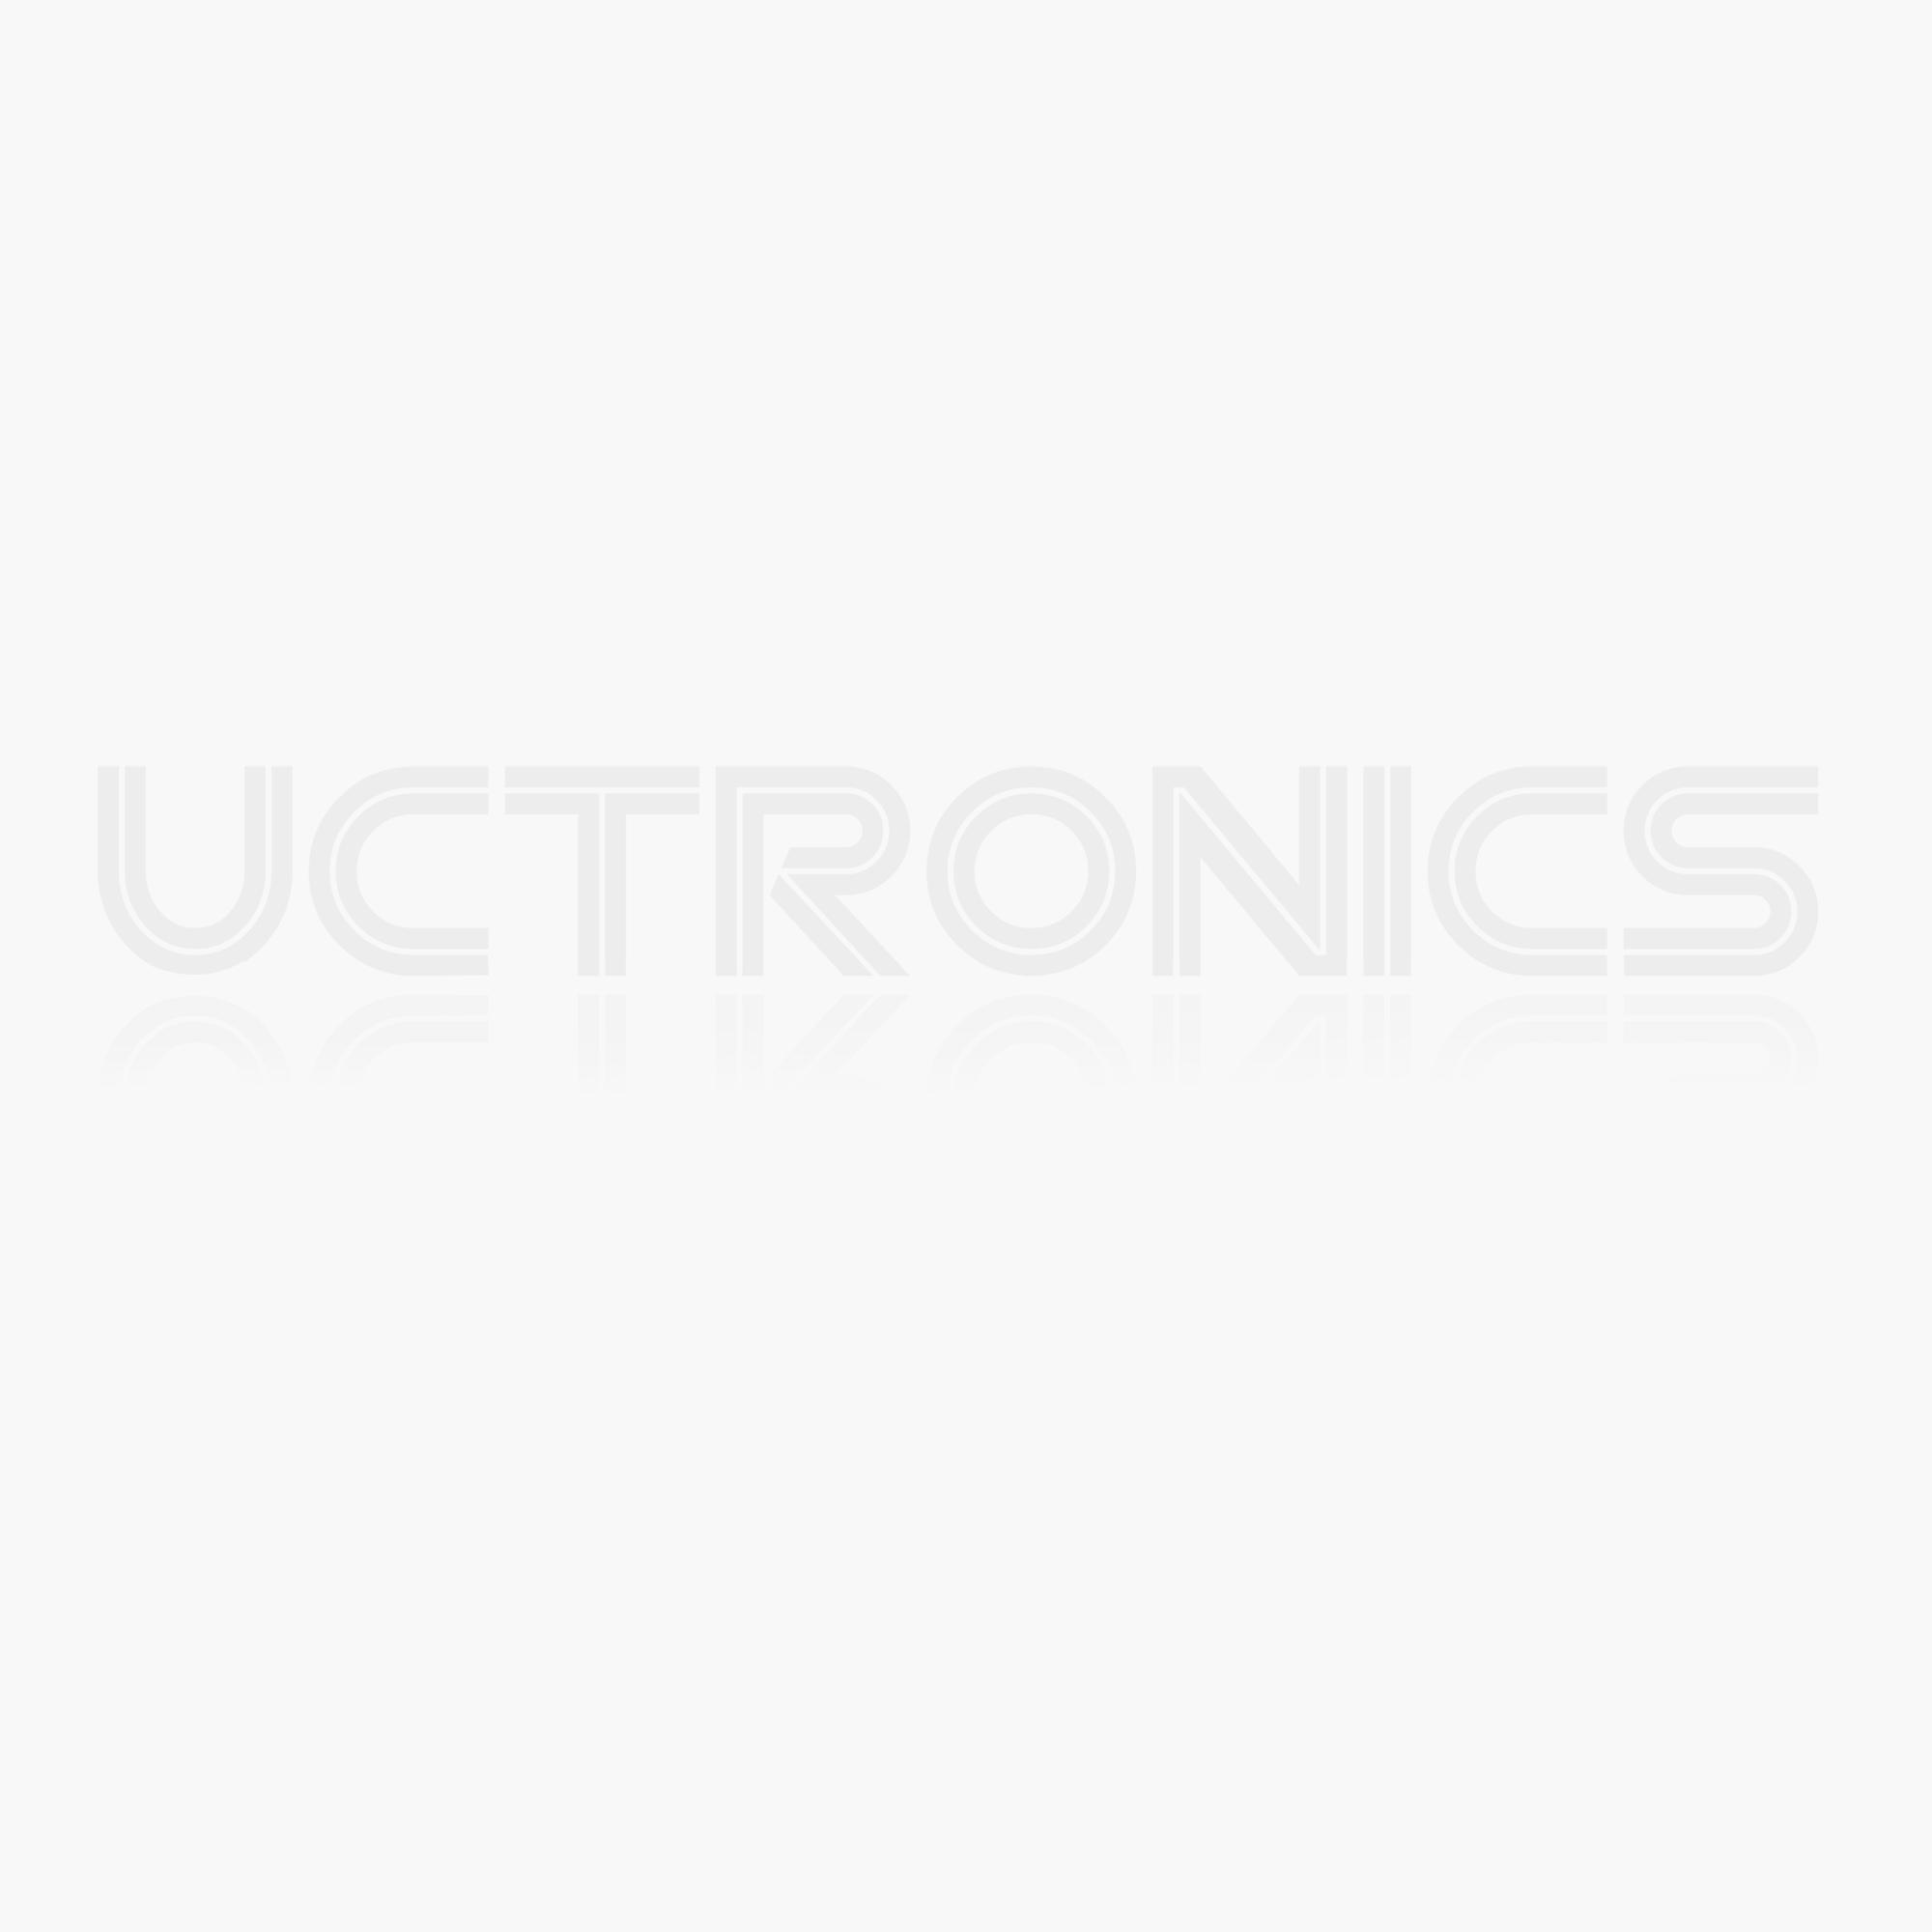 PCB Adapter Board for Mini Solderless Prototype 25 Tie-point Breadboard Arduino